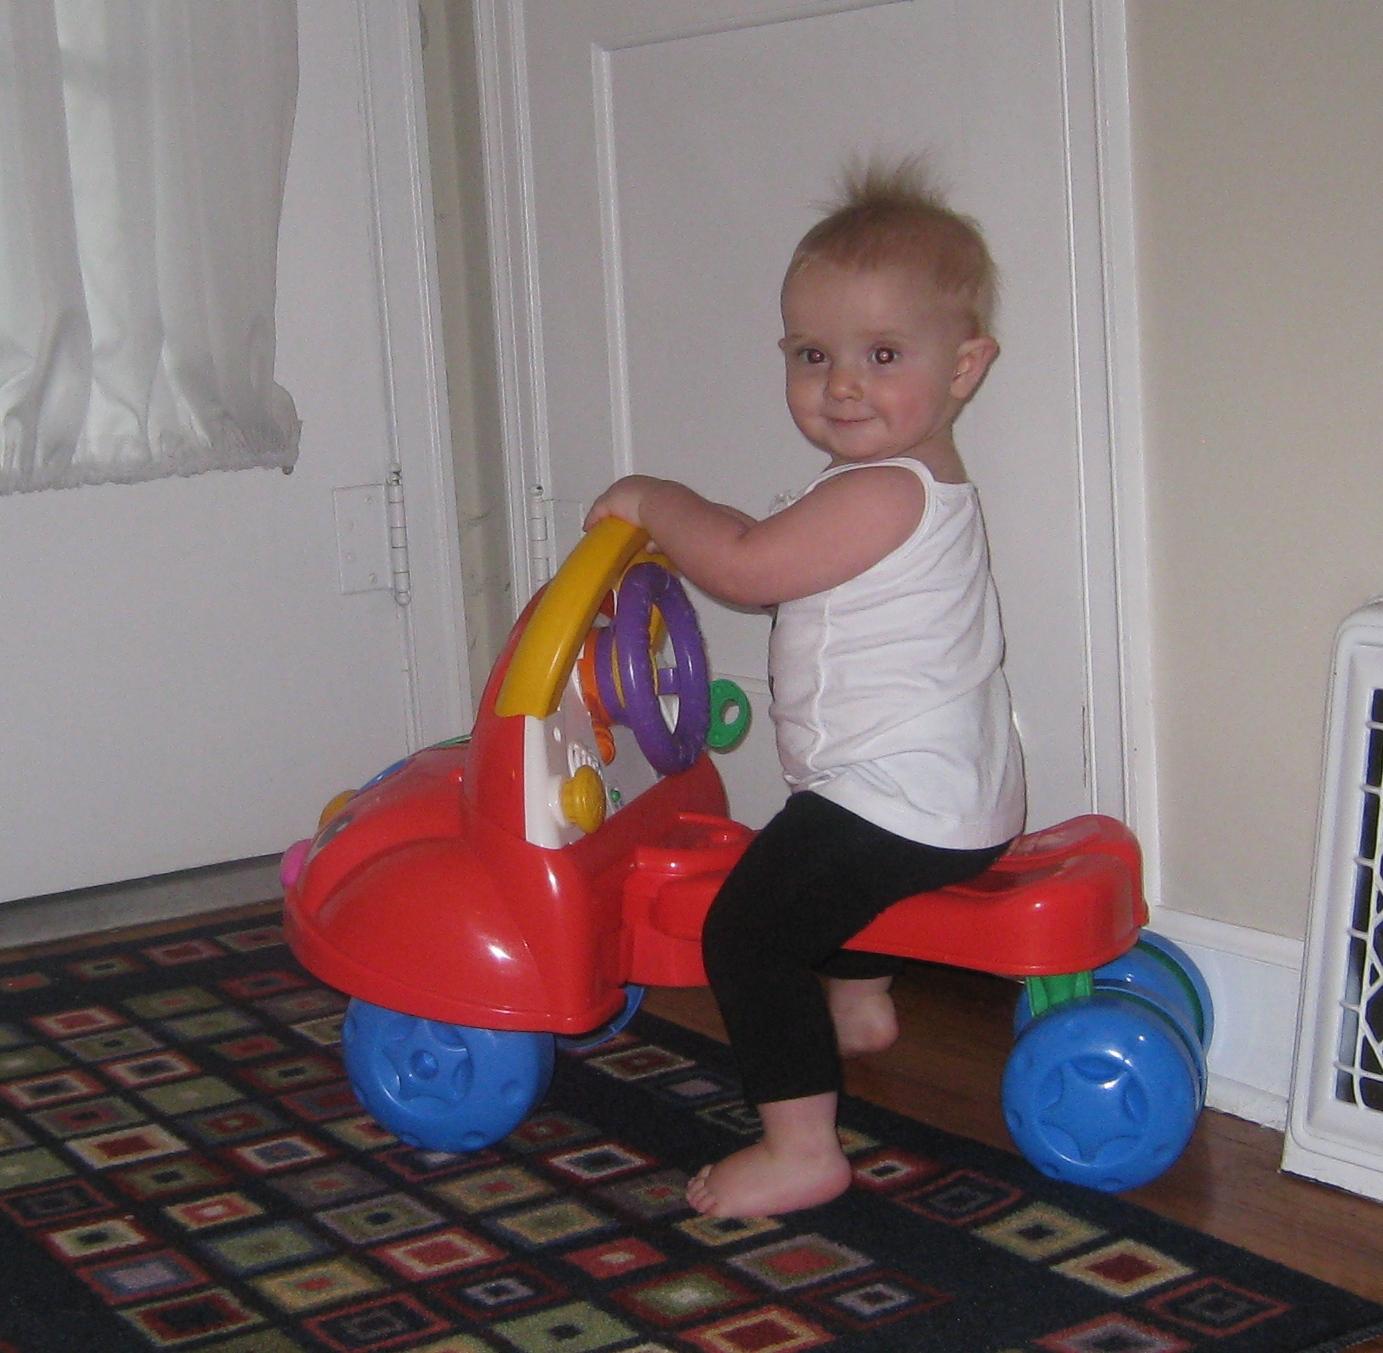 kivrin on her bike